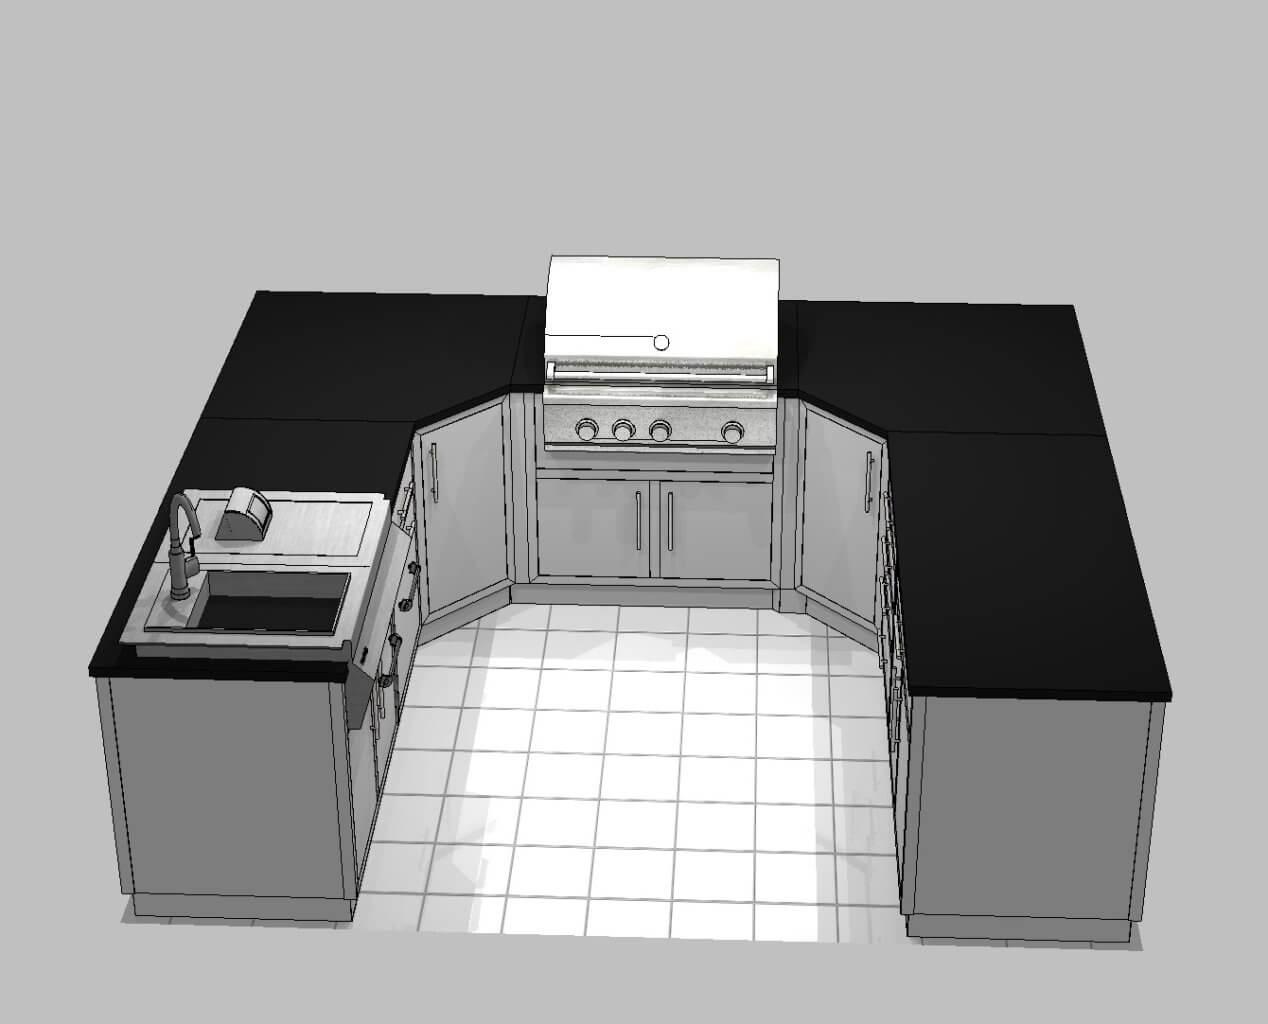 3D rendering for Textured Grey U Shaped Outdoor Kitchen